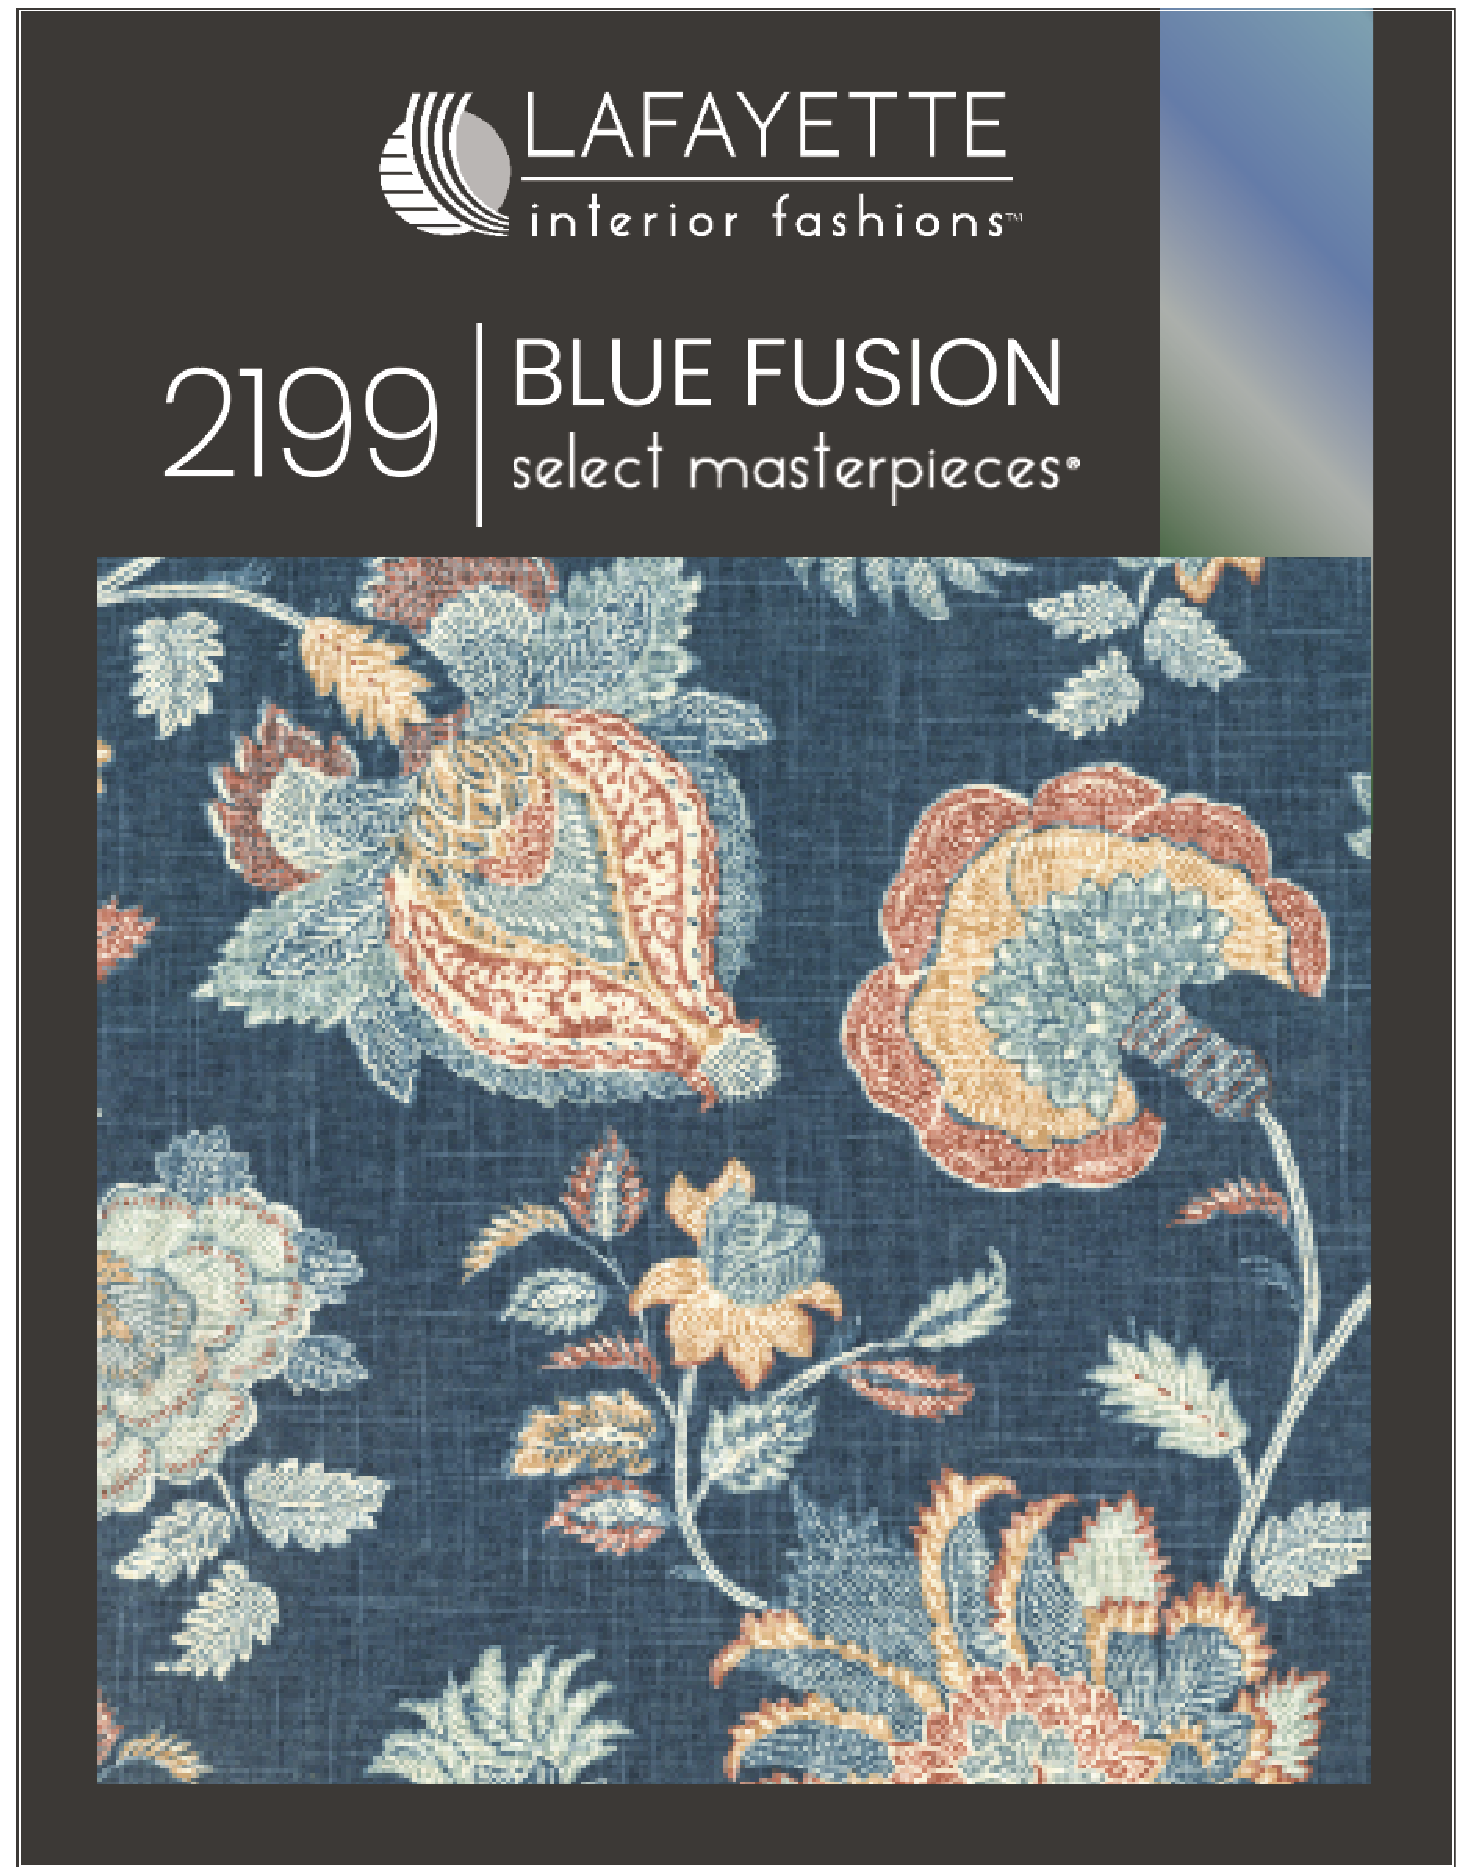 Blue Fusion 2199